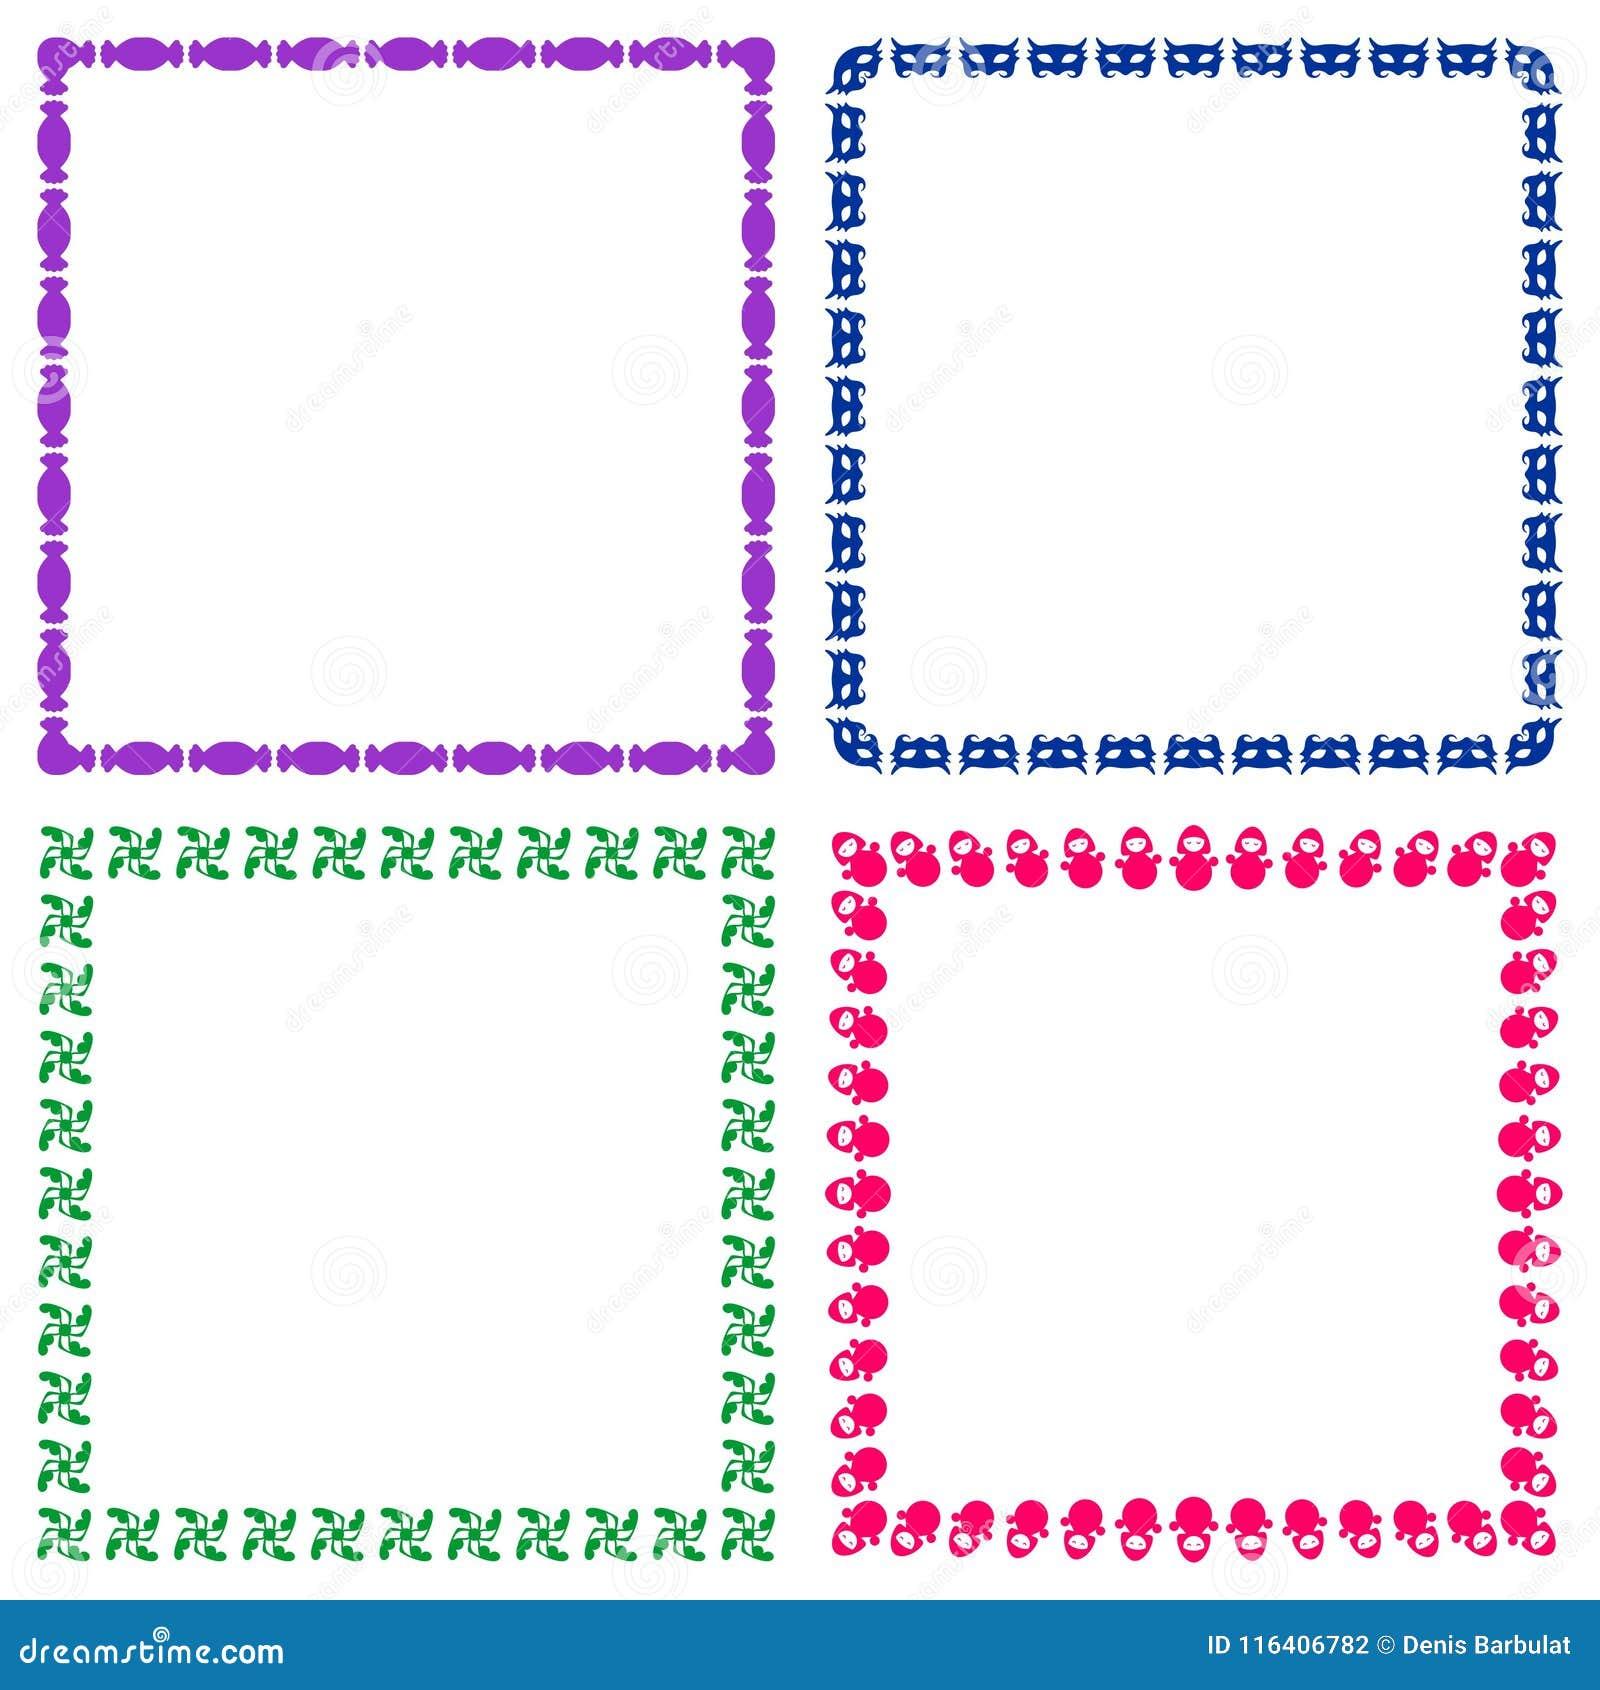 coloured child frames stock vector illustration of element 116406782